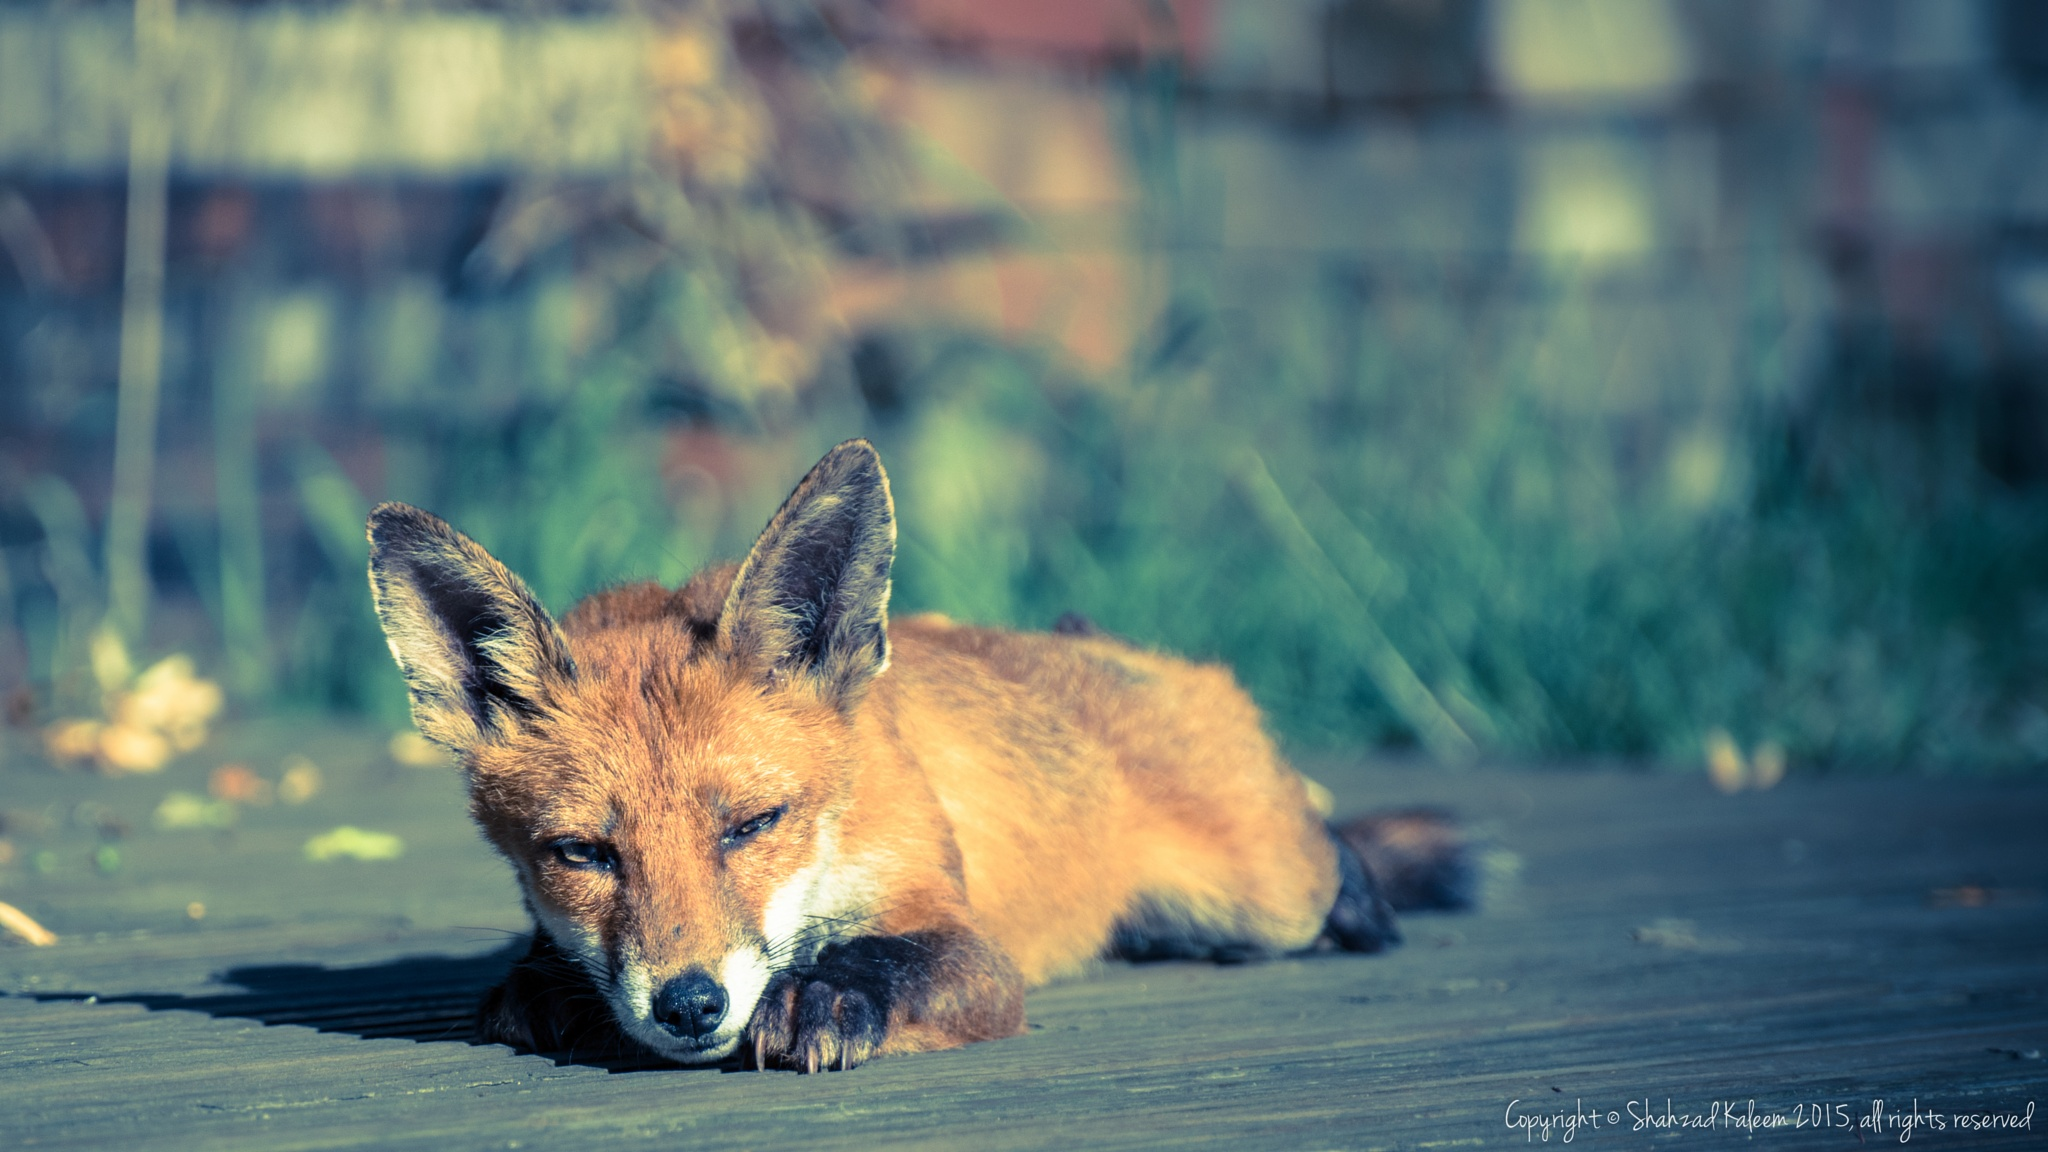 Lazy Mr. Fox by Shahzad Kaleem